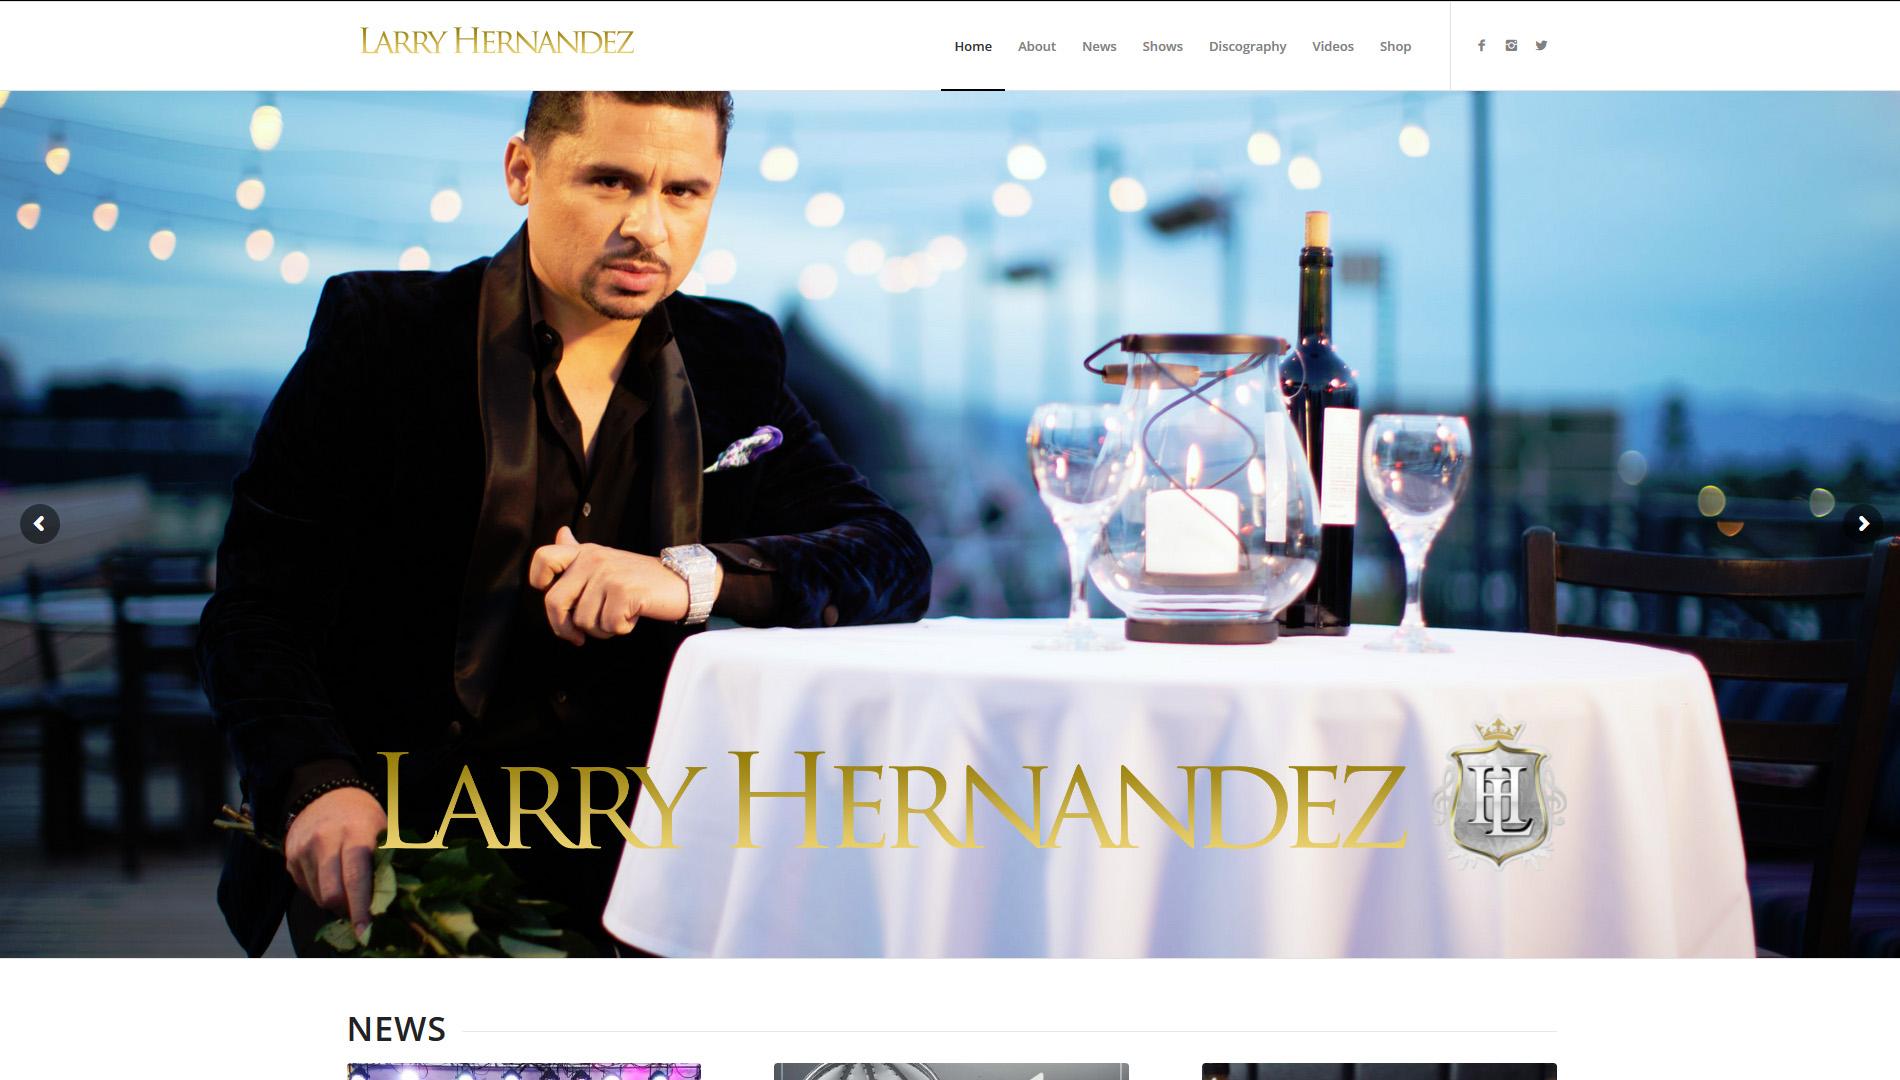 Larry Hernandez